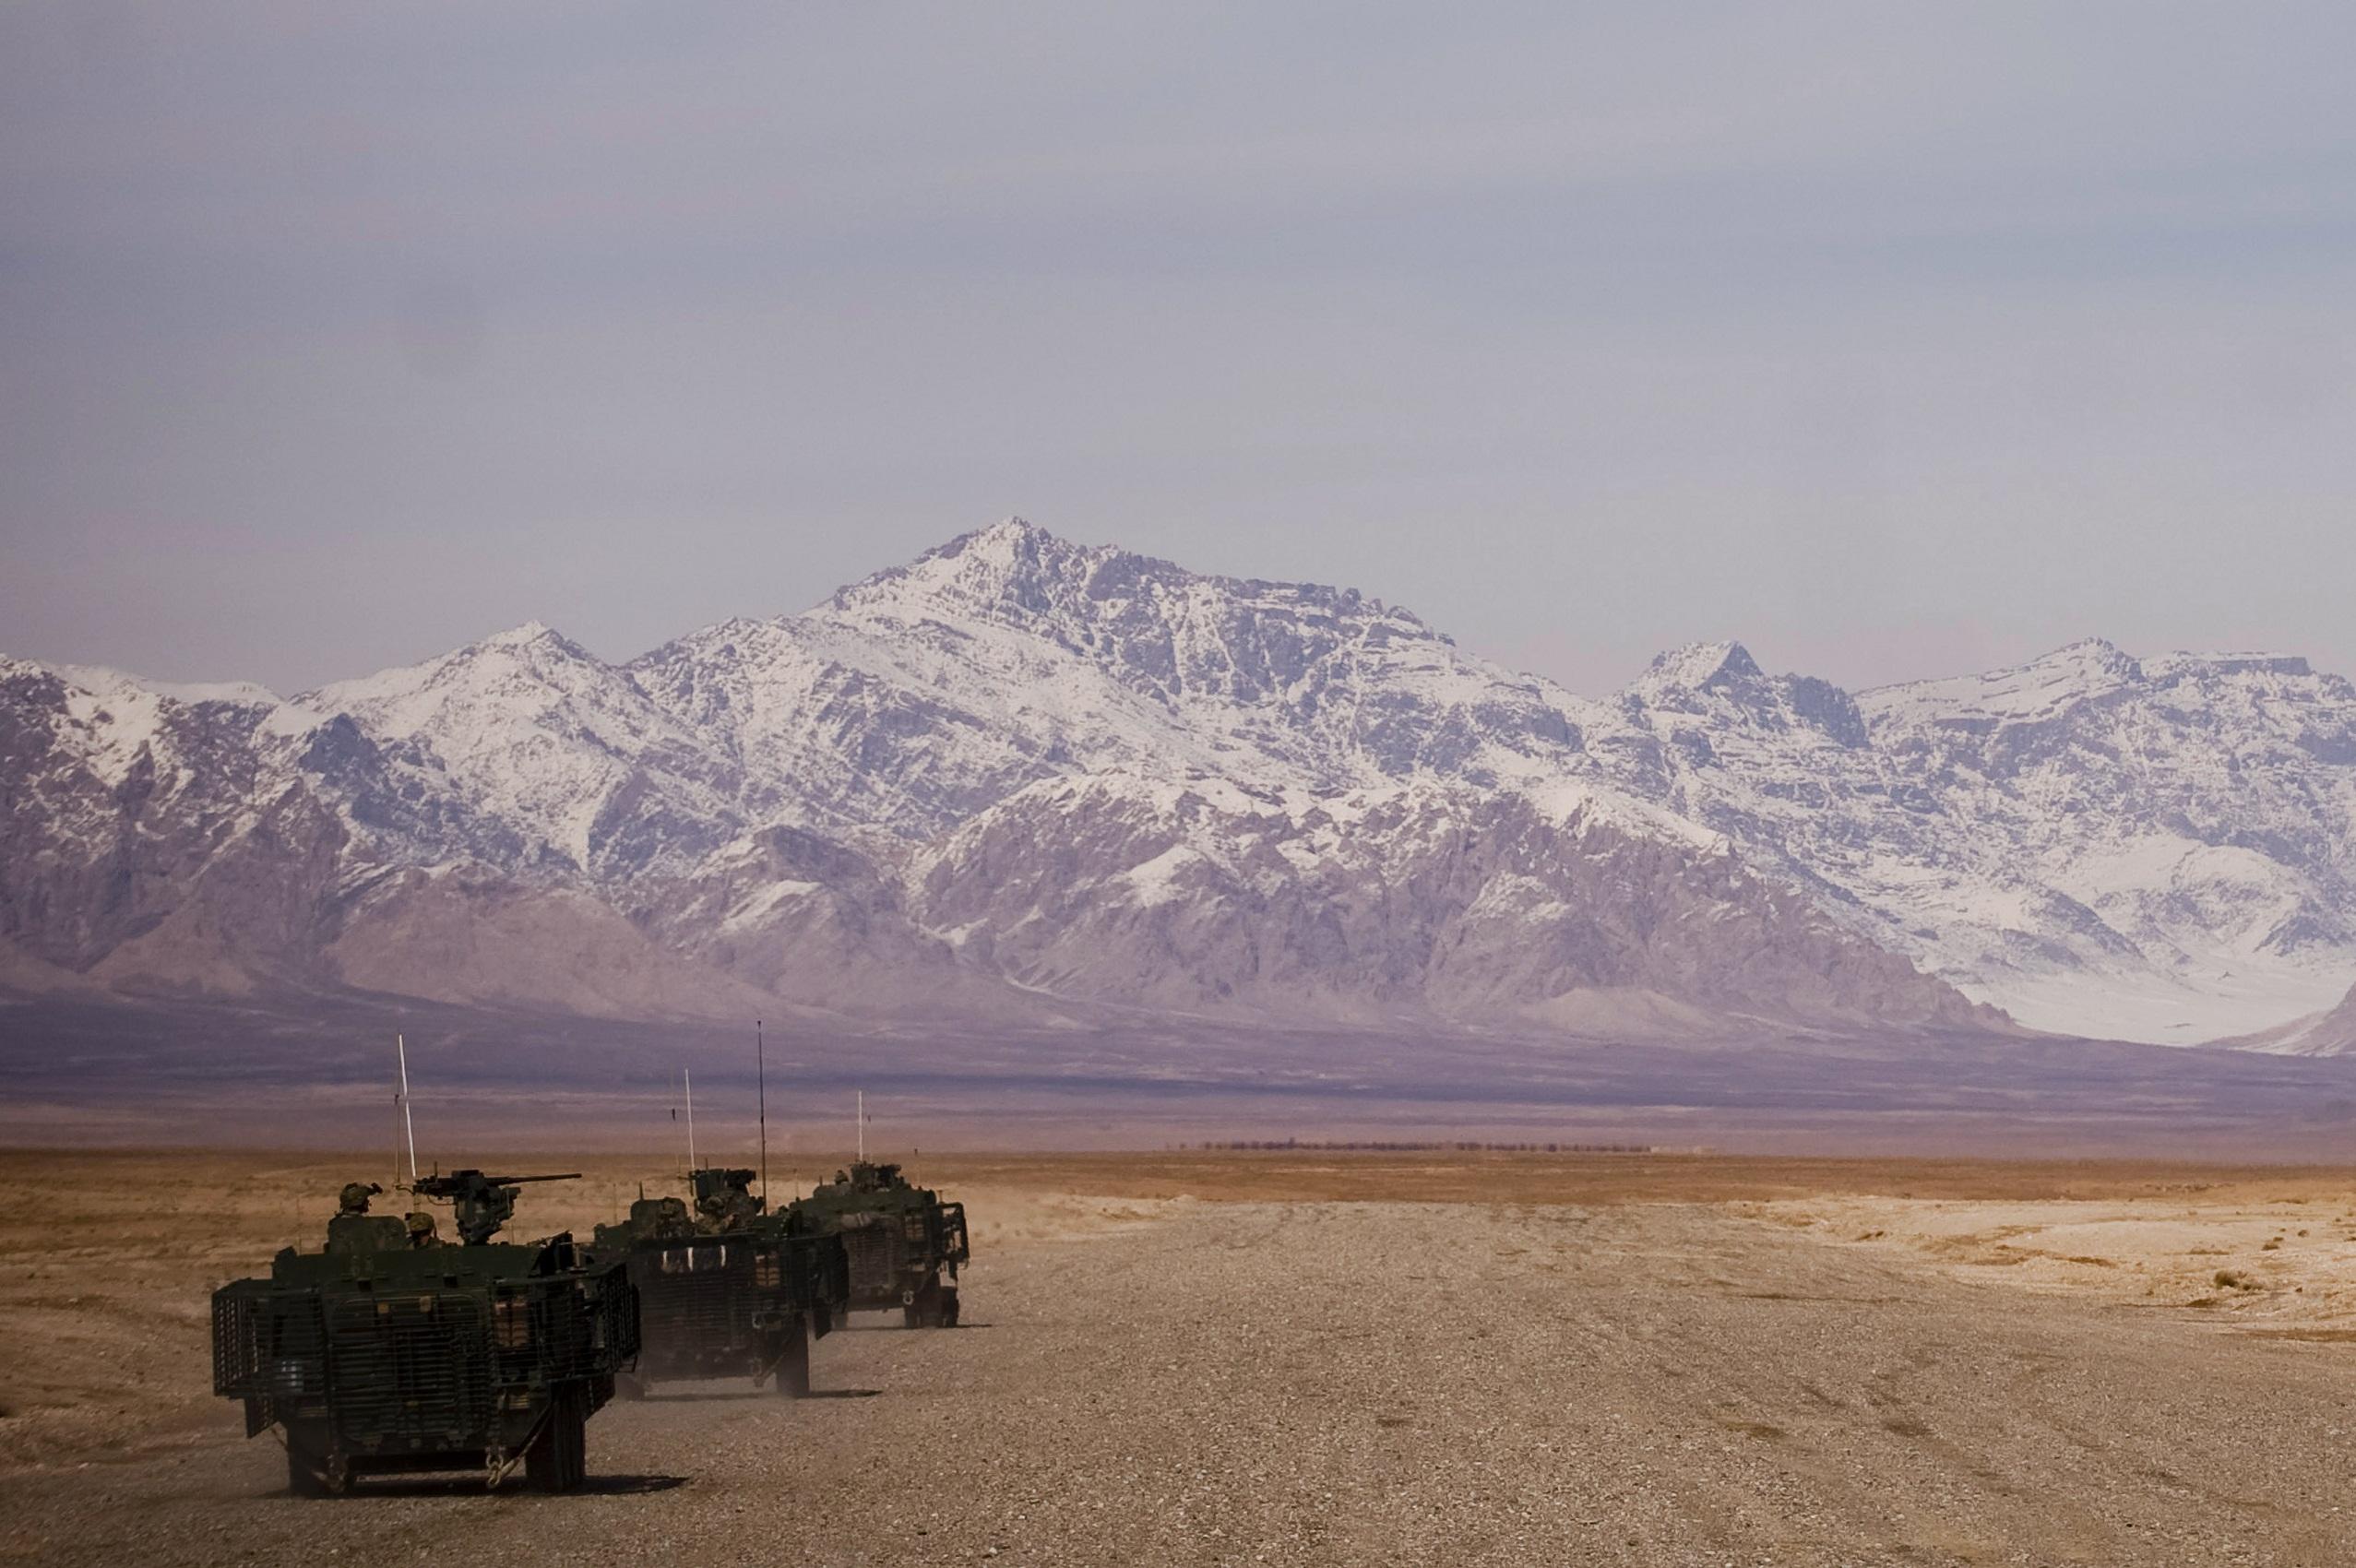 красавица картинки про афганистан про одну